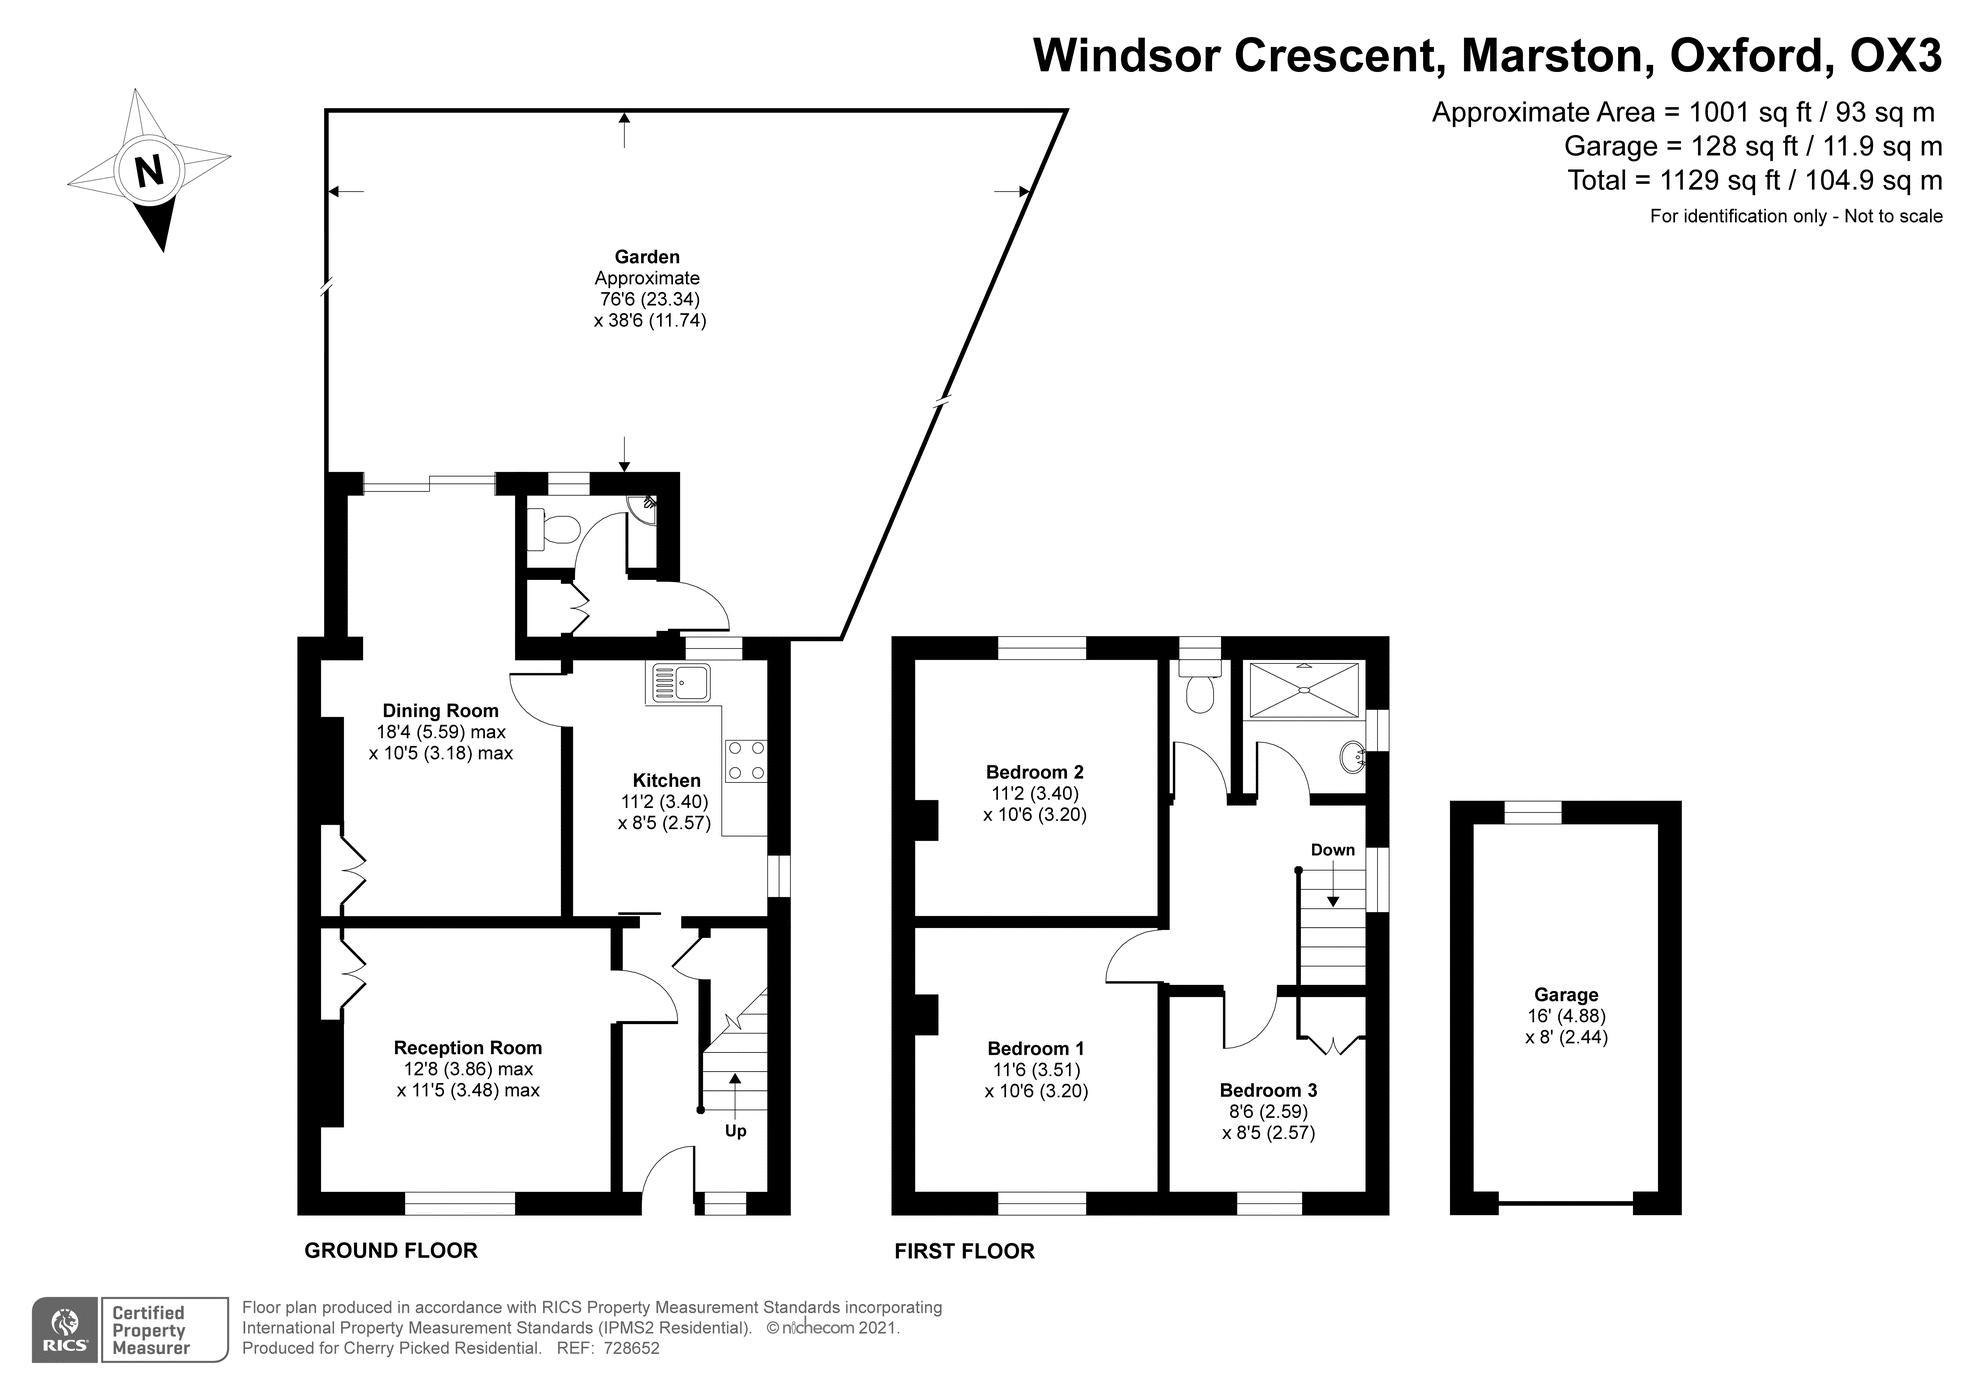 Windsor Crescent Marston